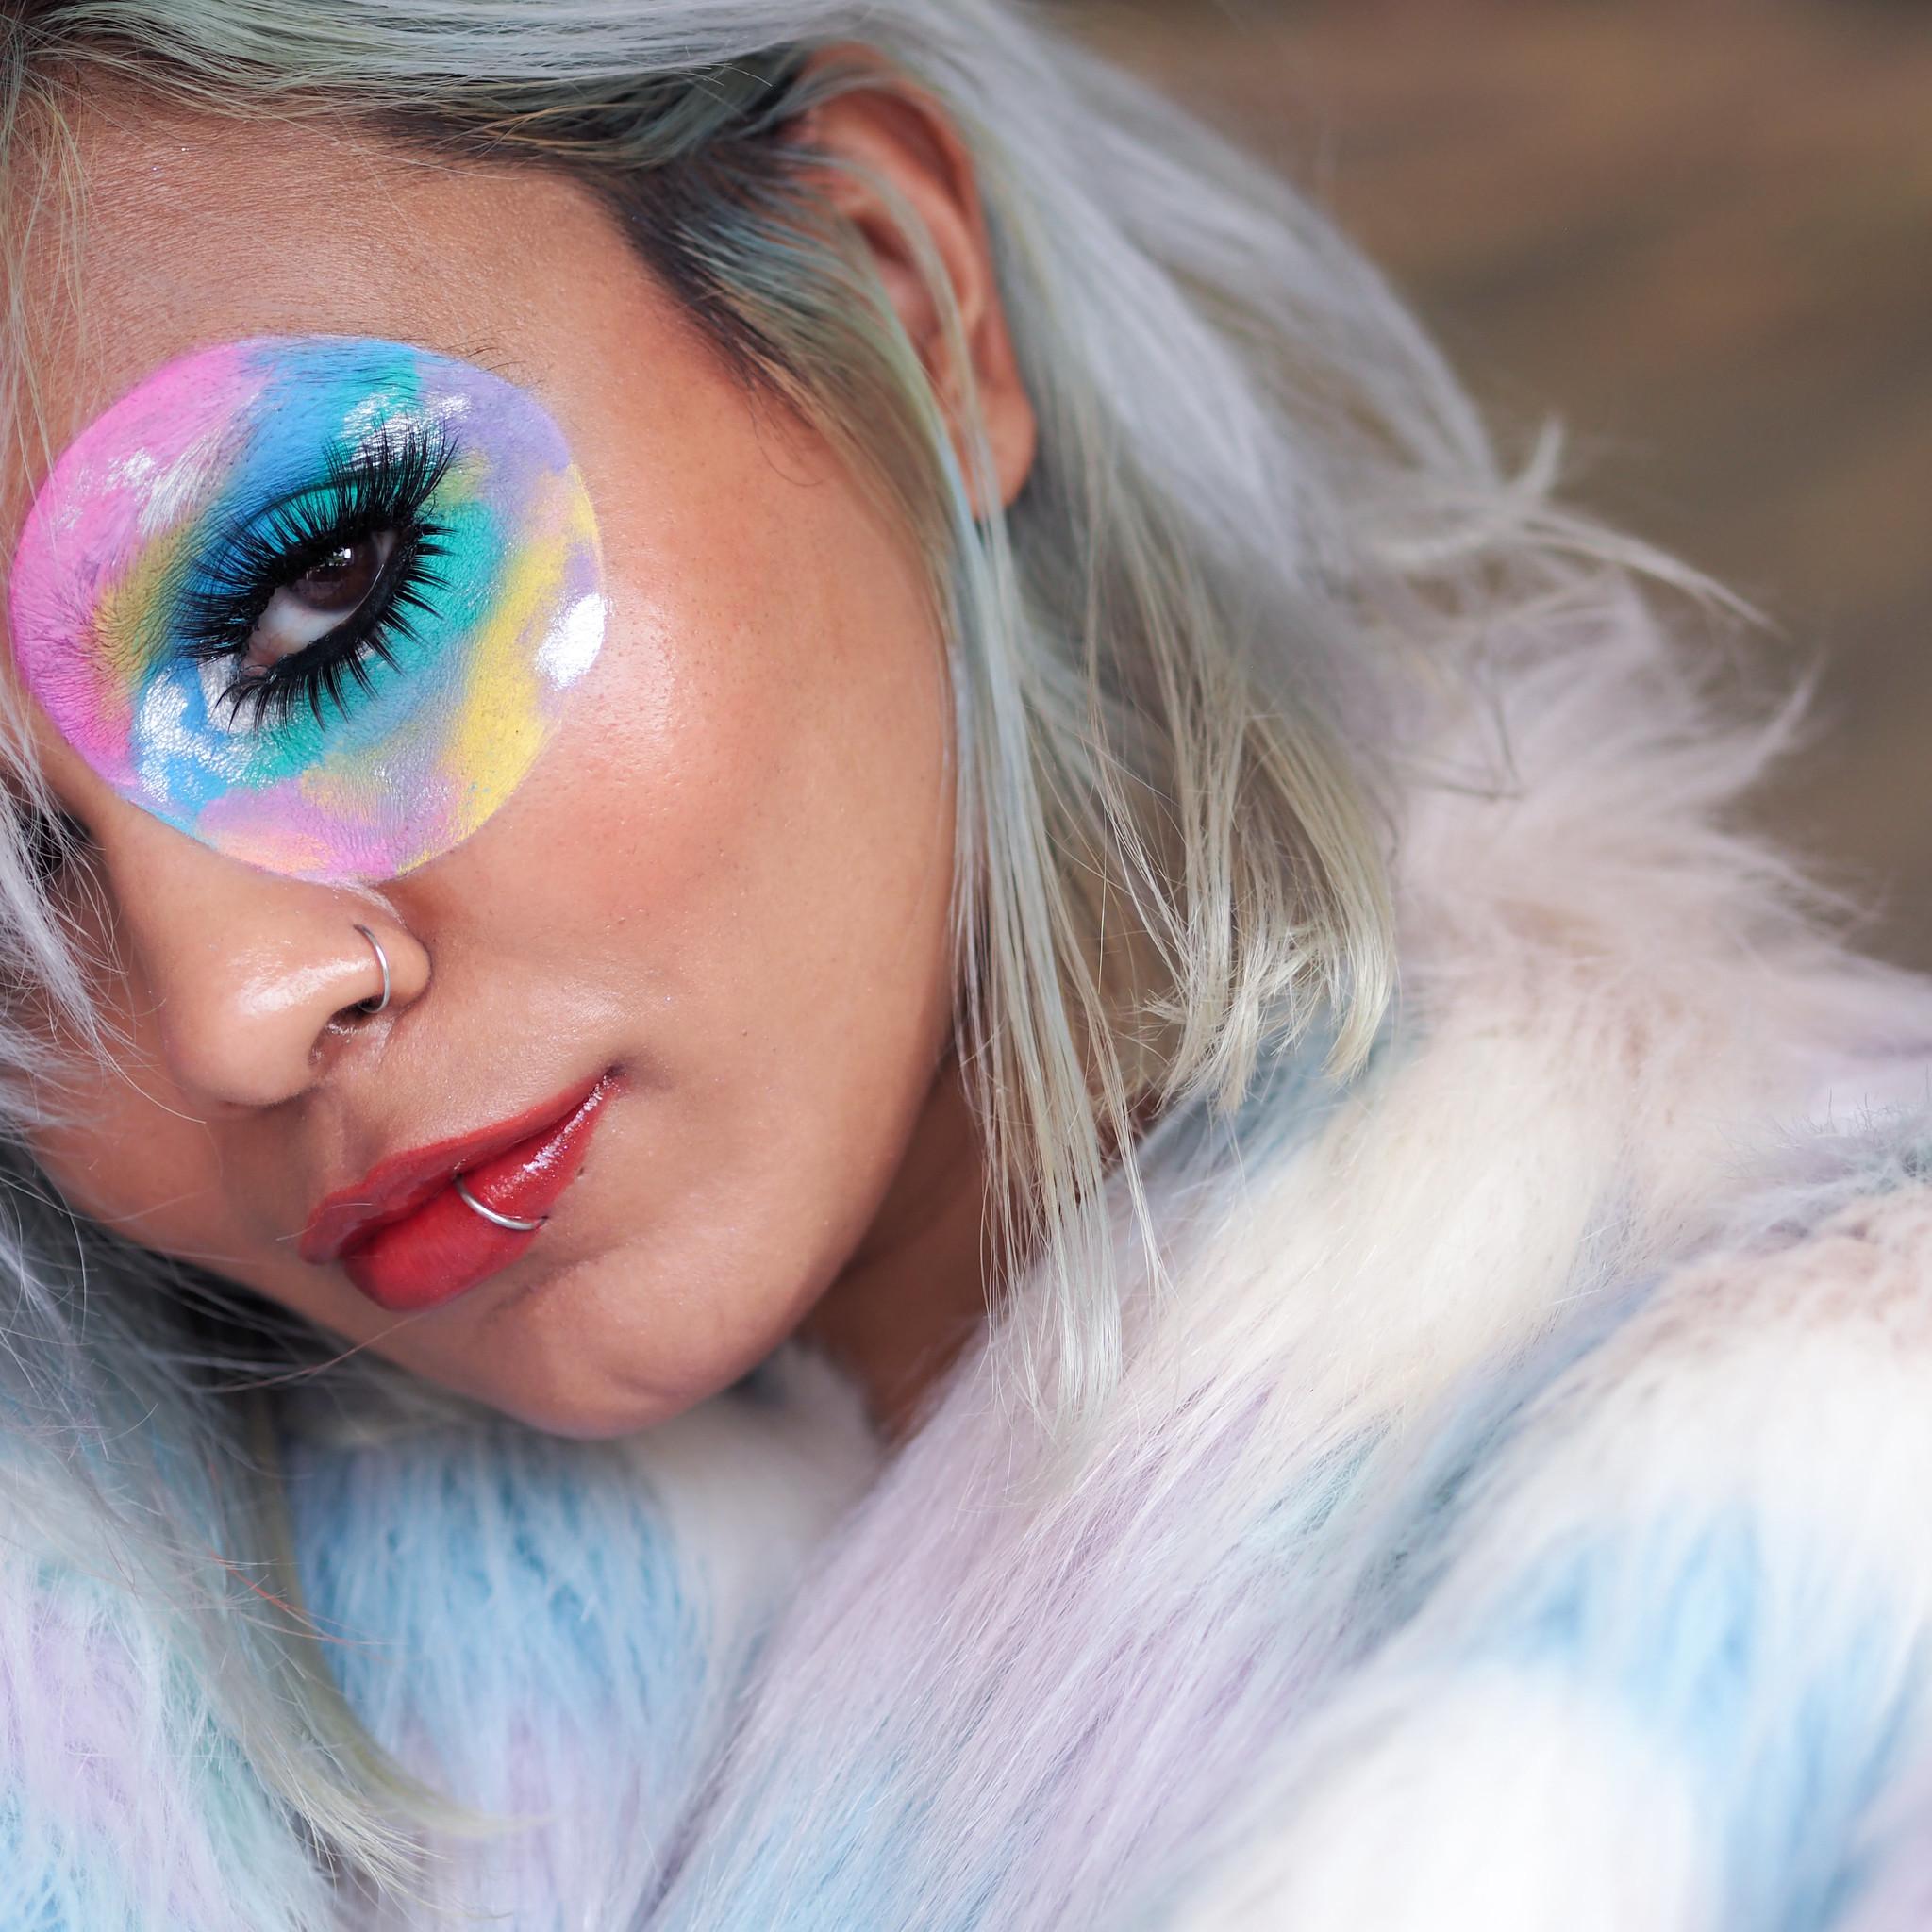 Depixym cosmetic emulsions pigments makeup look